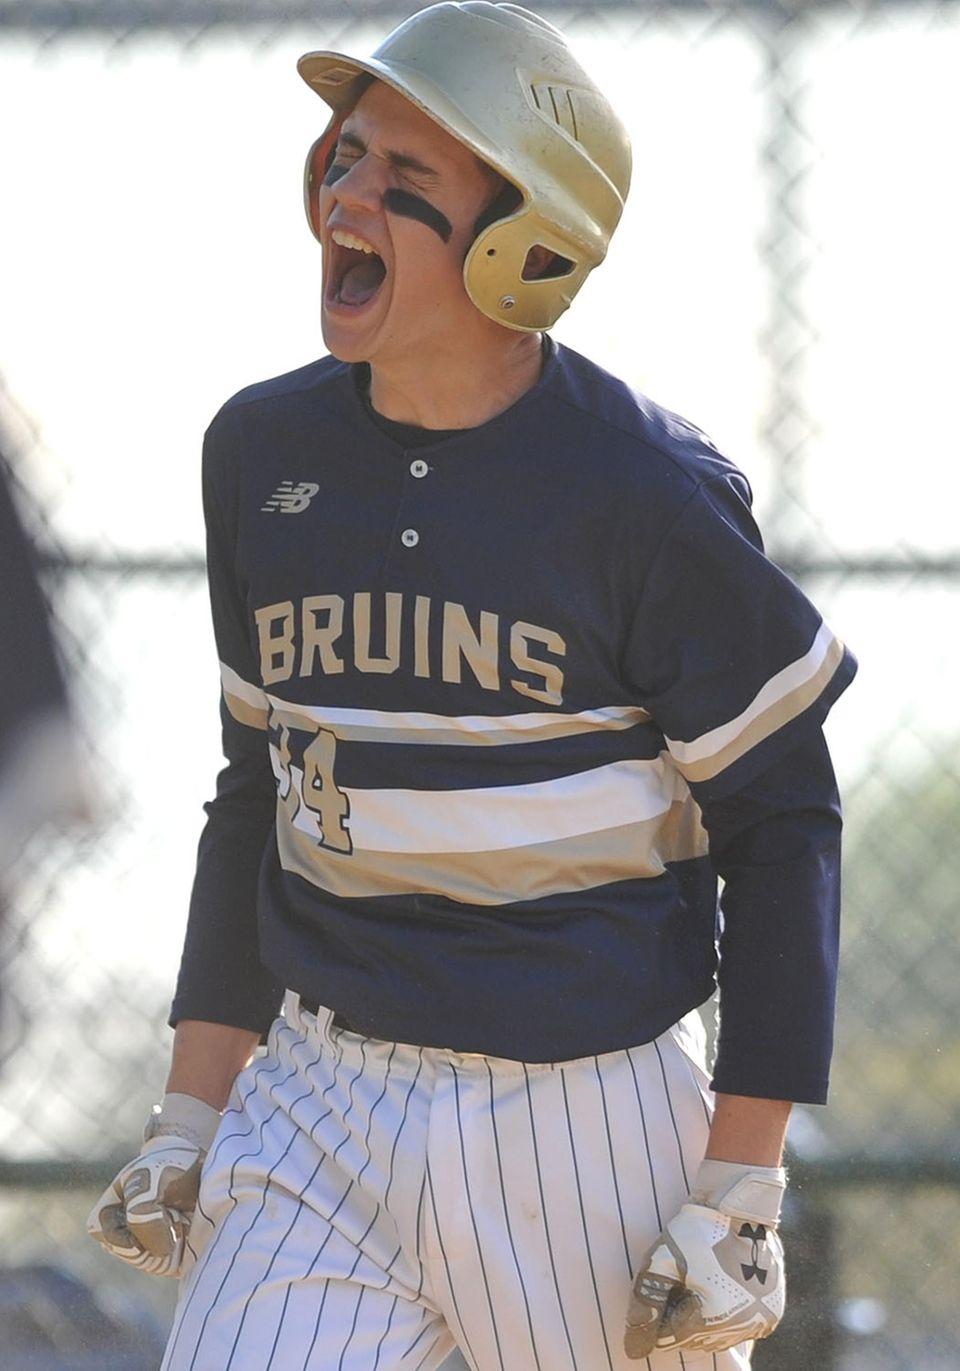 Allan Drew, Baldwin first baseman, reacts after crossing